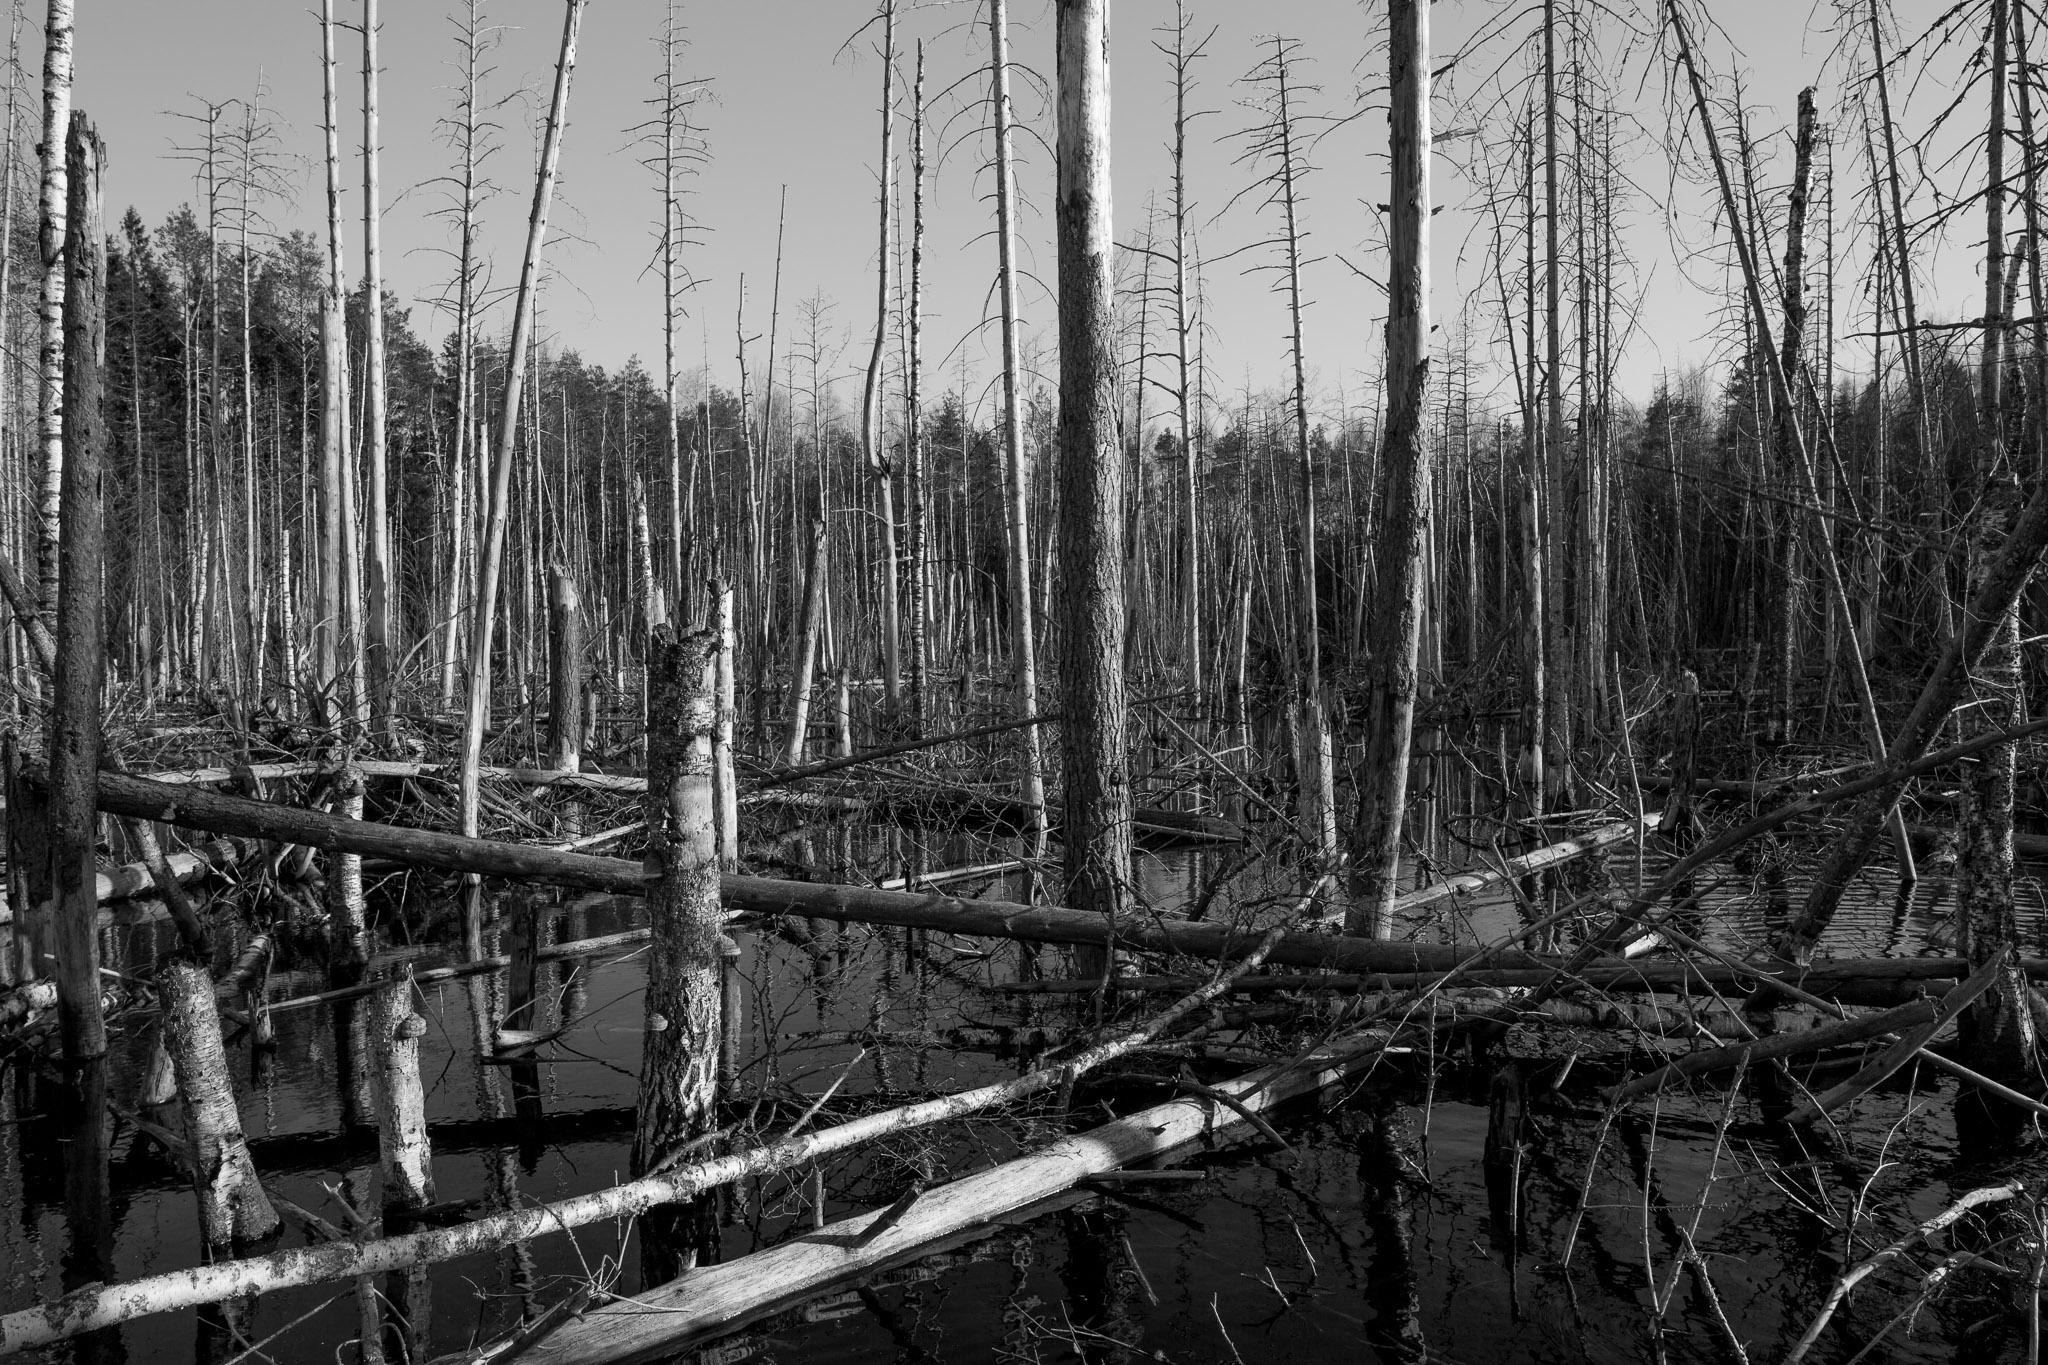 Deadwood over Collapsed Ahtme Mine